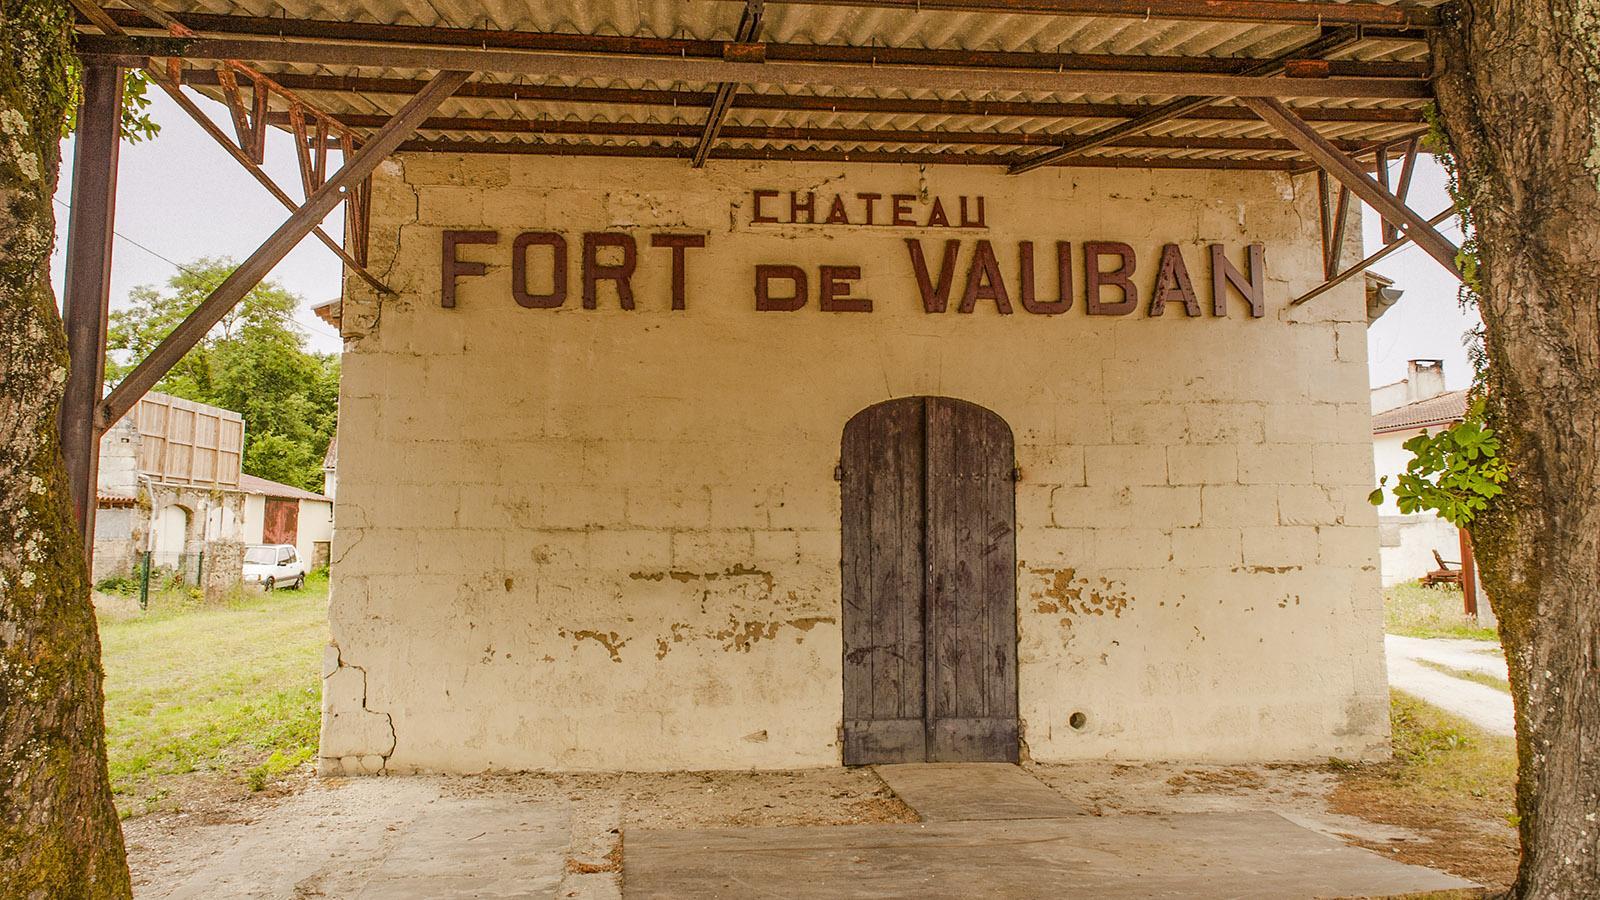 Médoc: Château Fort-de-Vauban. Foto: Hilke Maunder